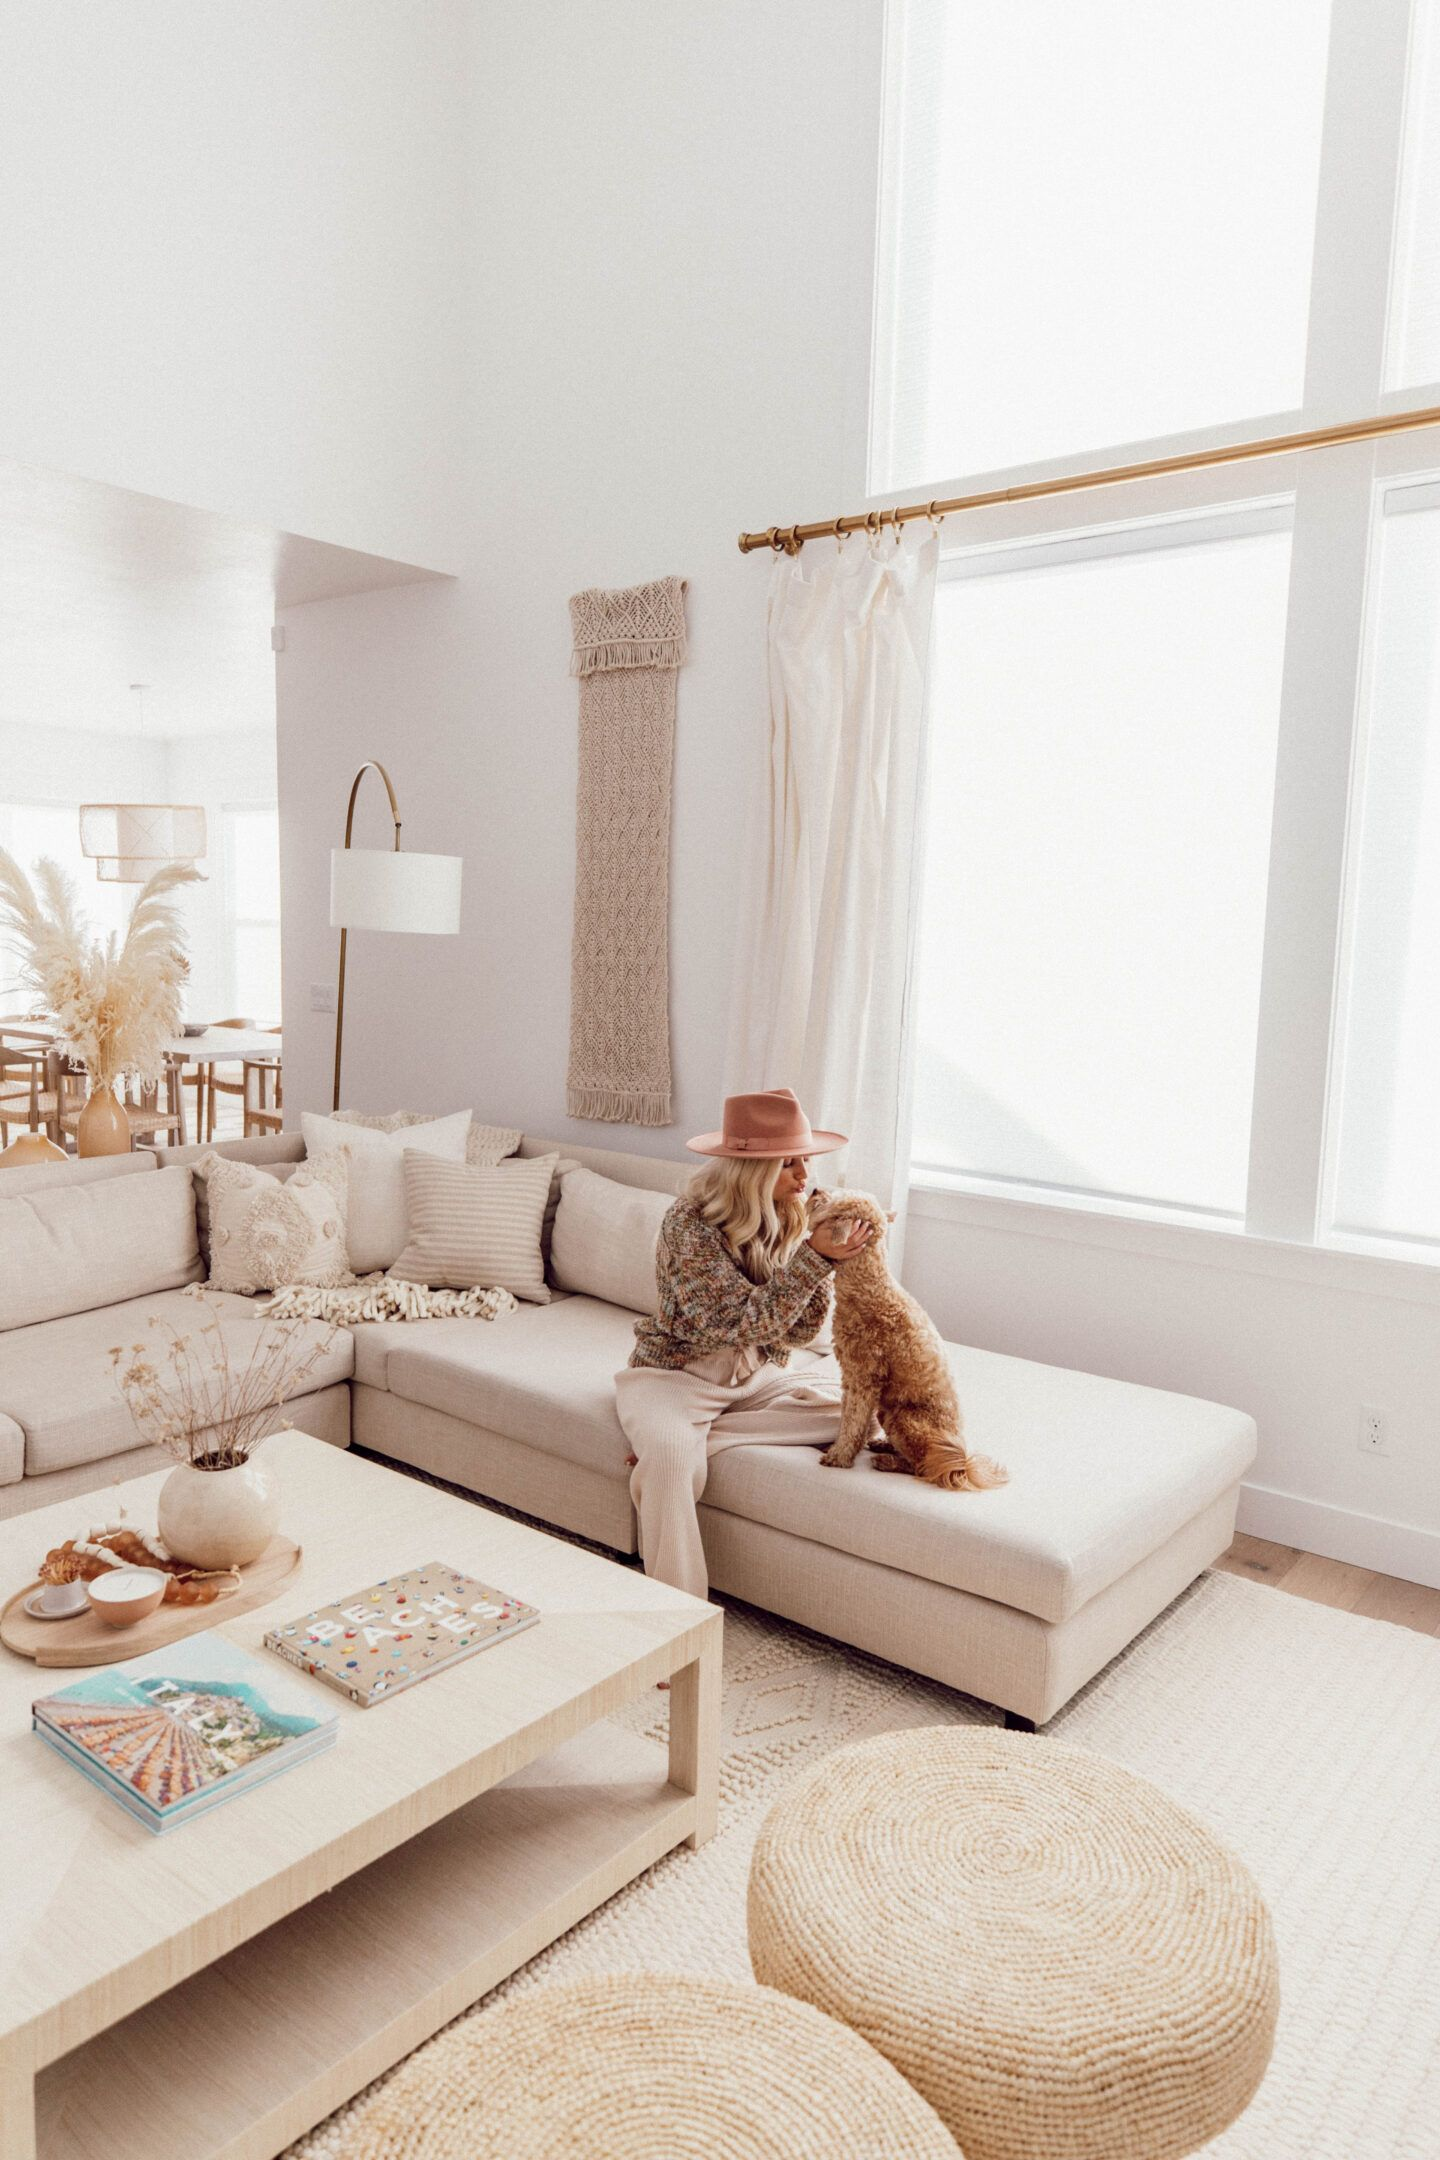 Living Room Makeover In 2020 Living Room Makeover Room